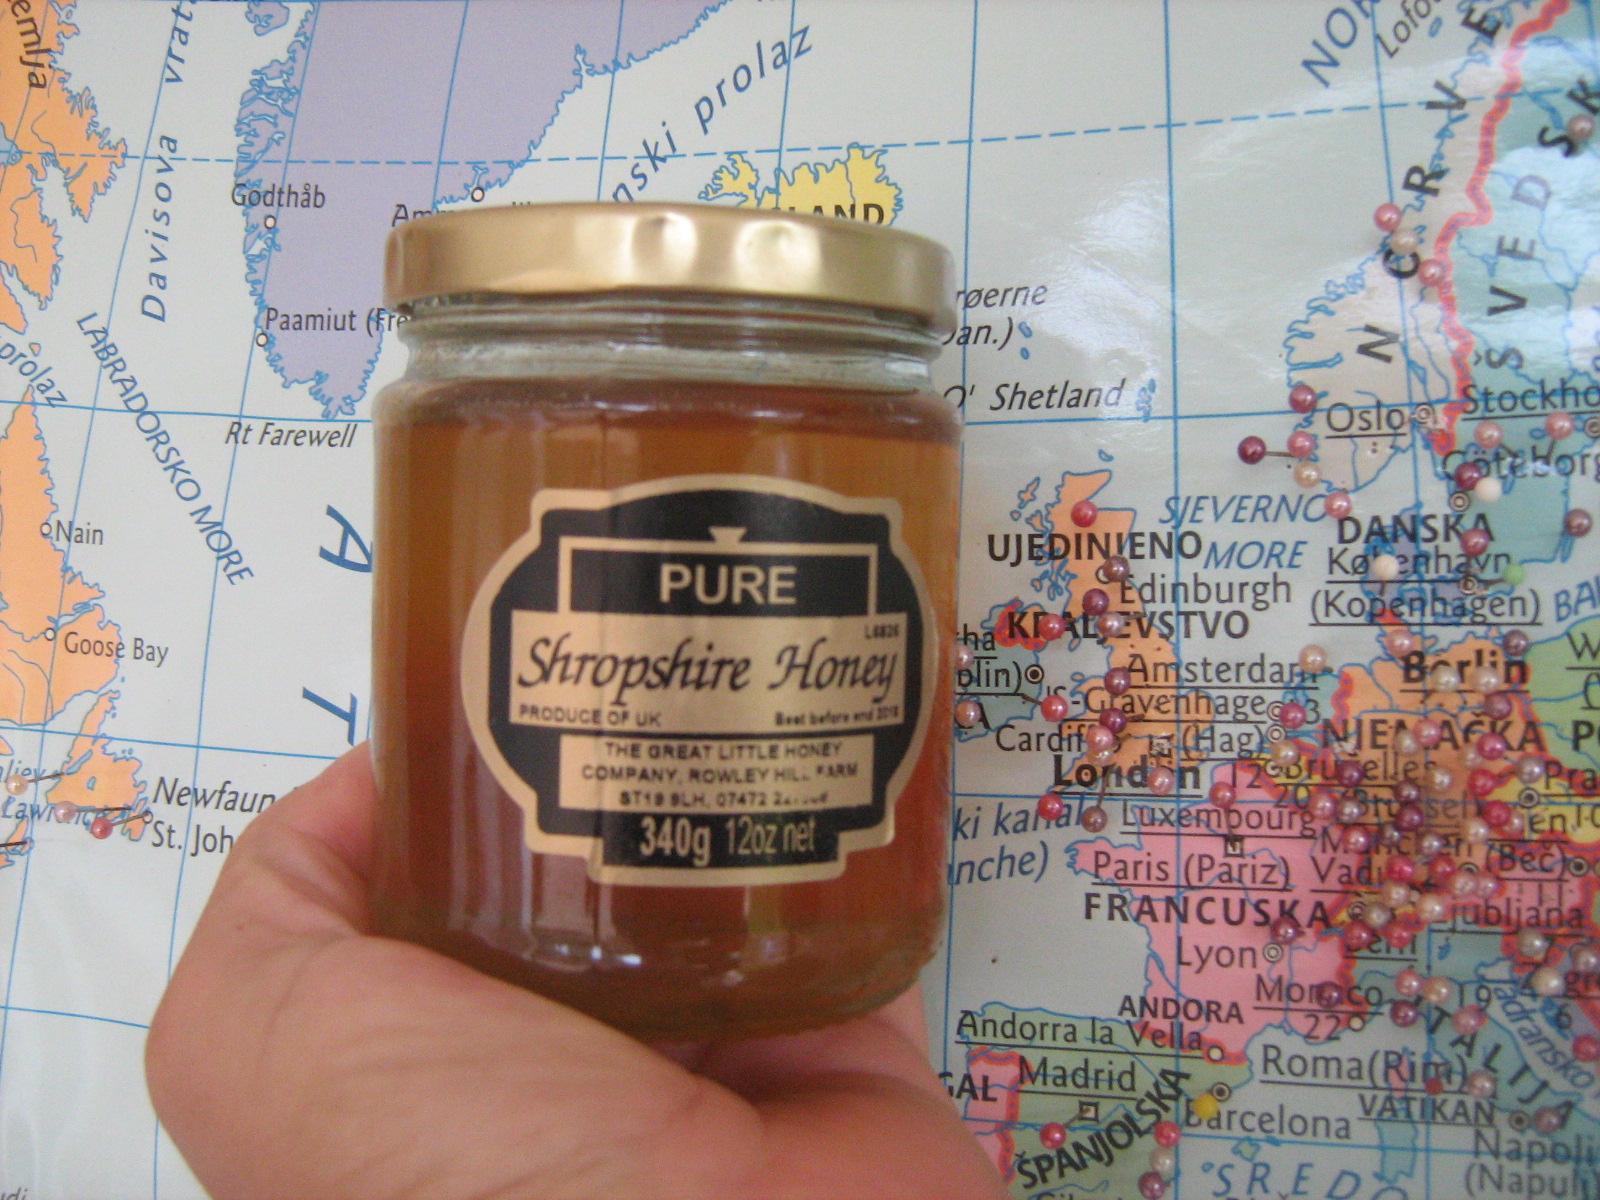 The Langerons Shropshire honey